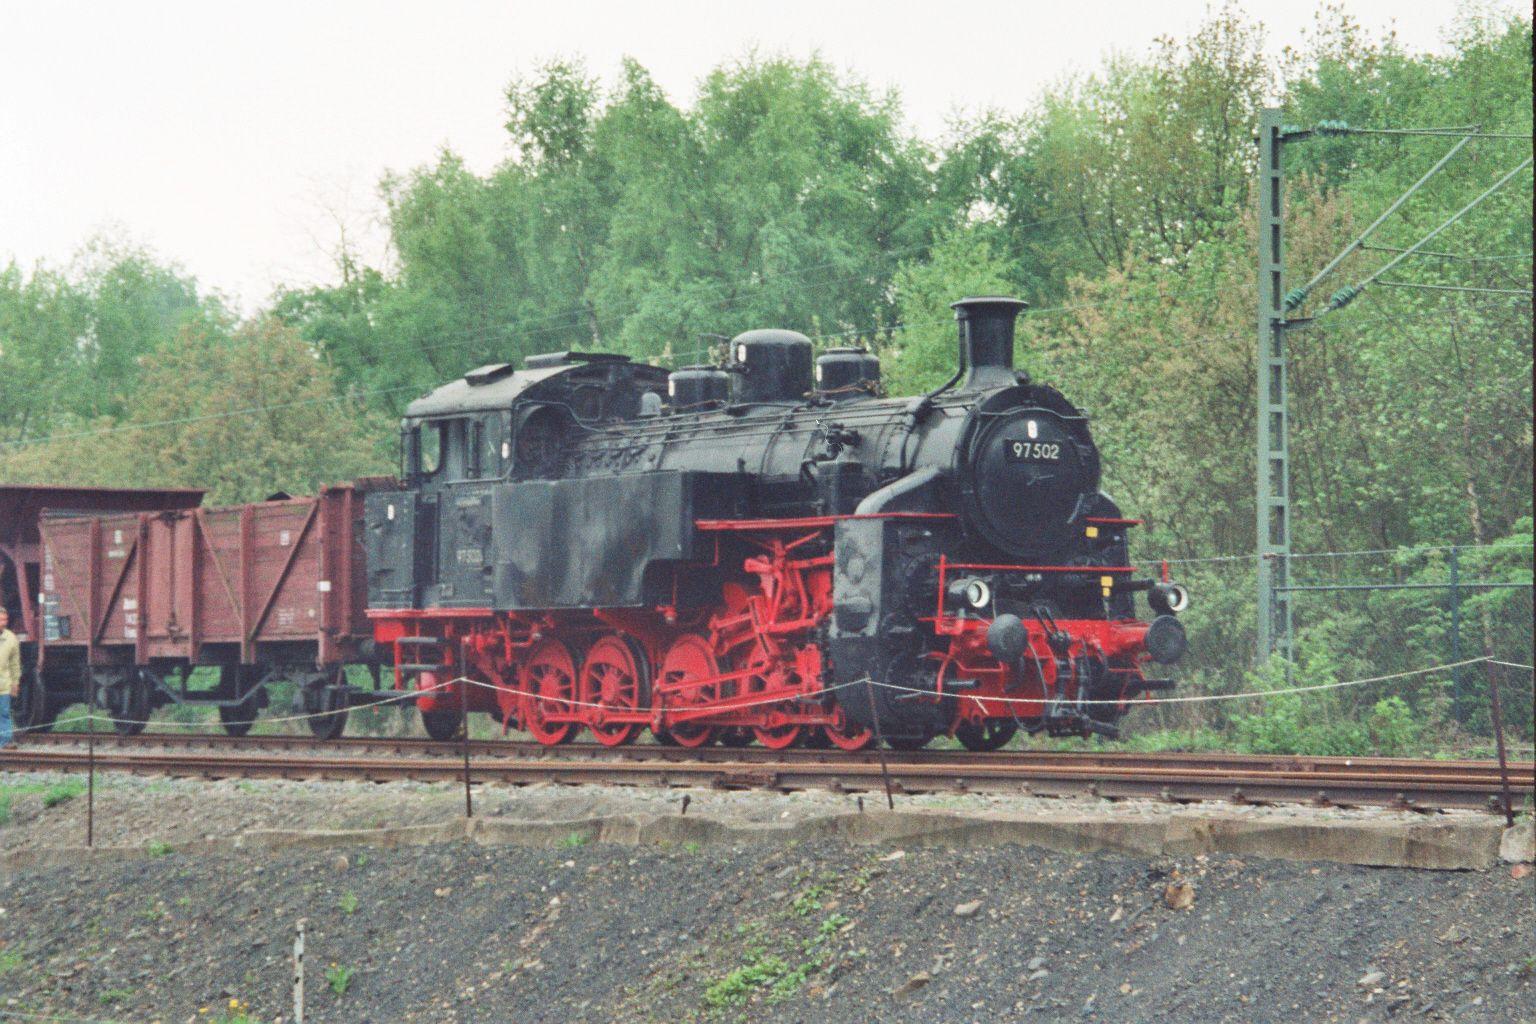 97 502 Bochum-Dahlhausen, 1996